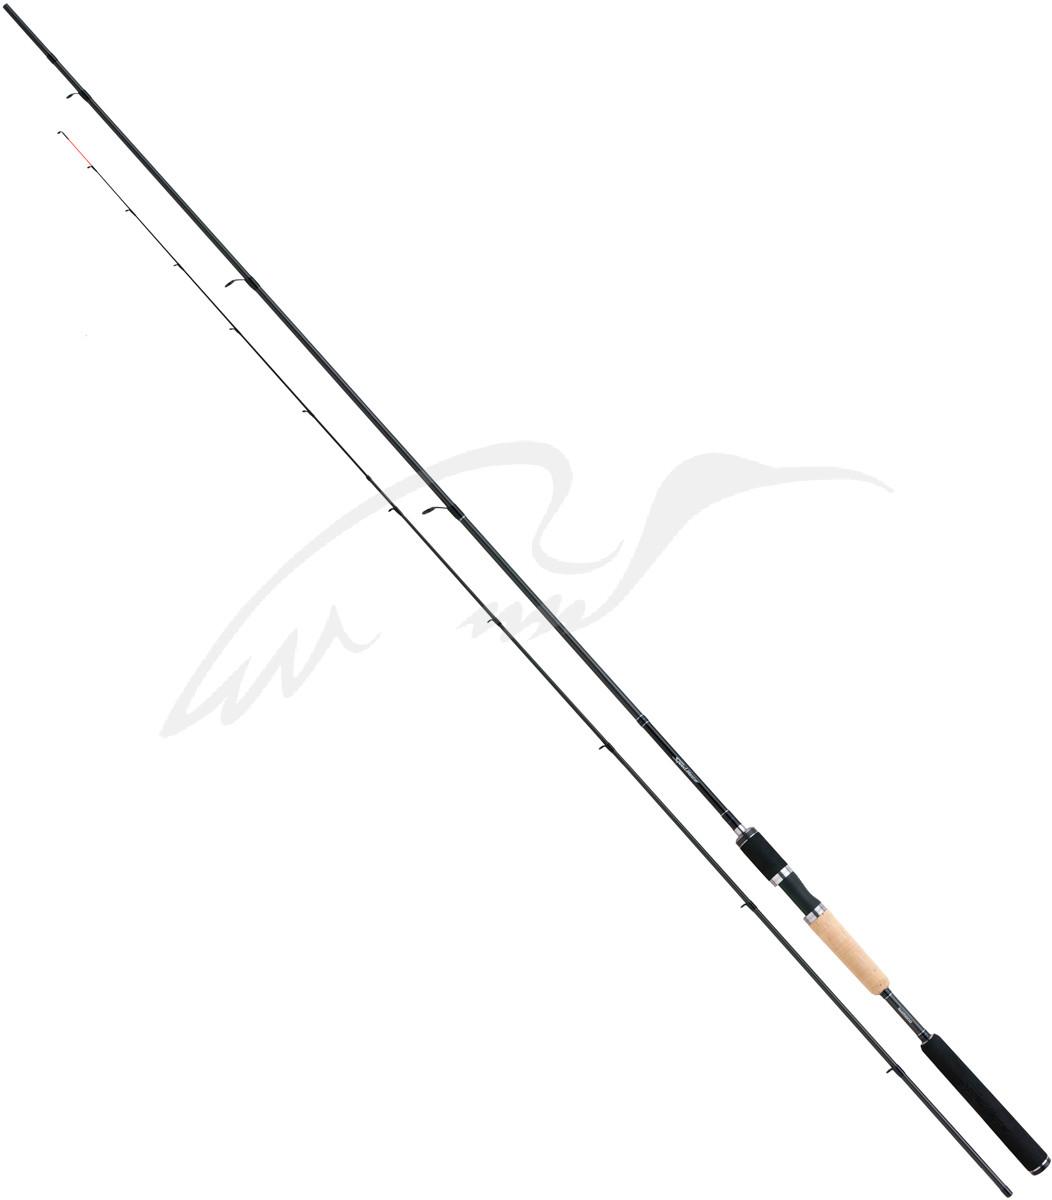 Фідерне вудлище Shimano Speedmaster AX Multi Commercial Feeder 2.74-3.35 m max 70g